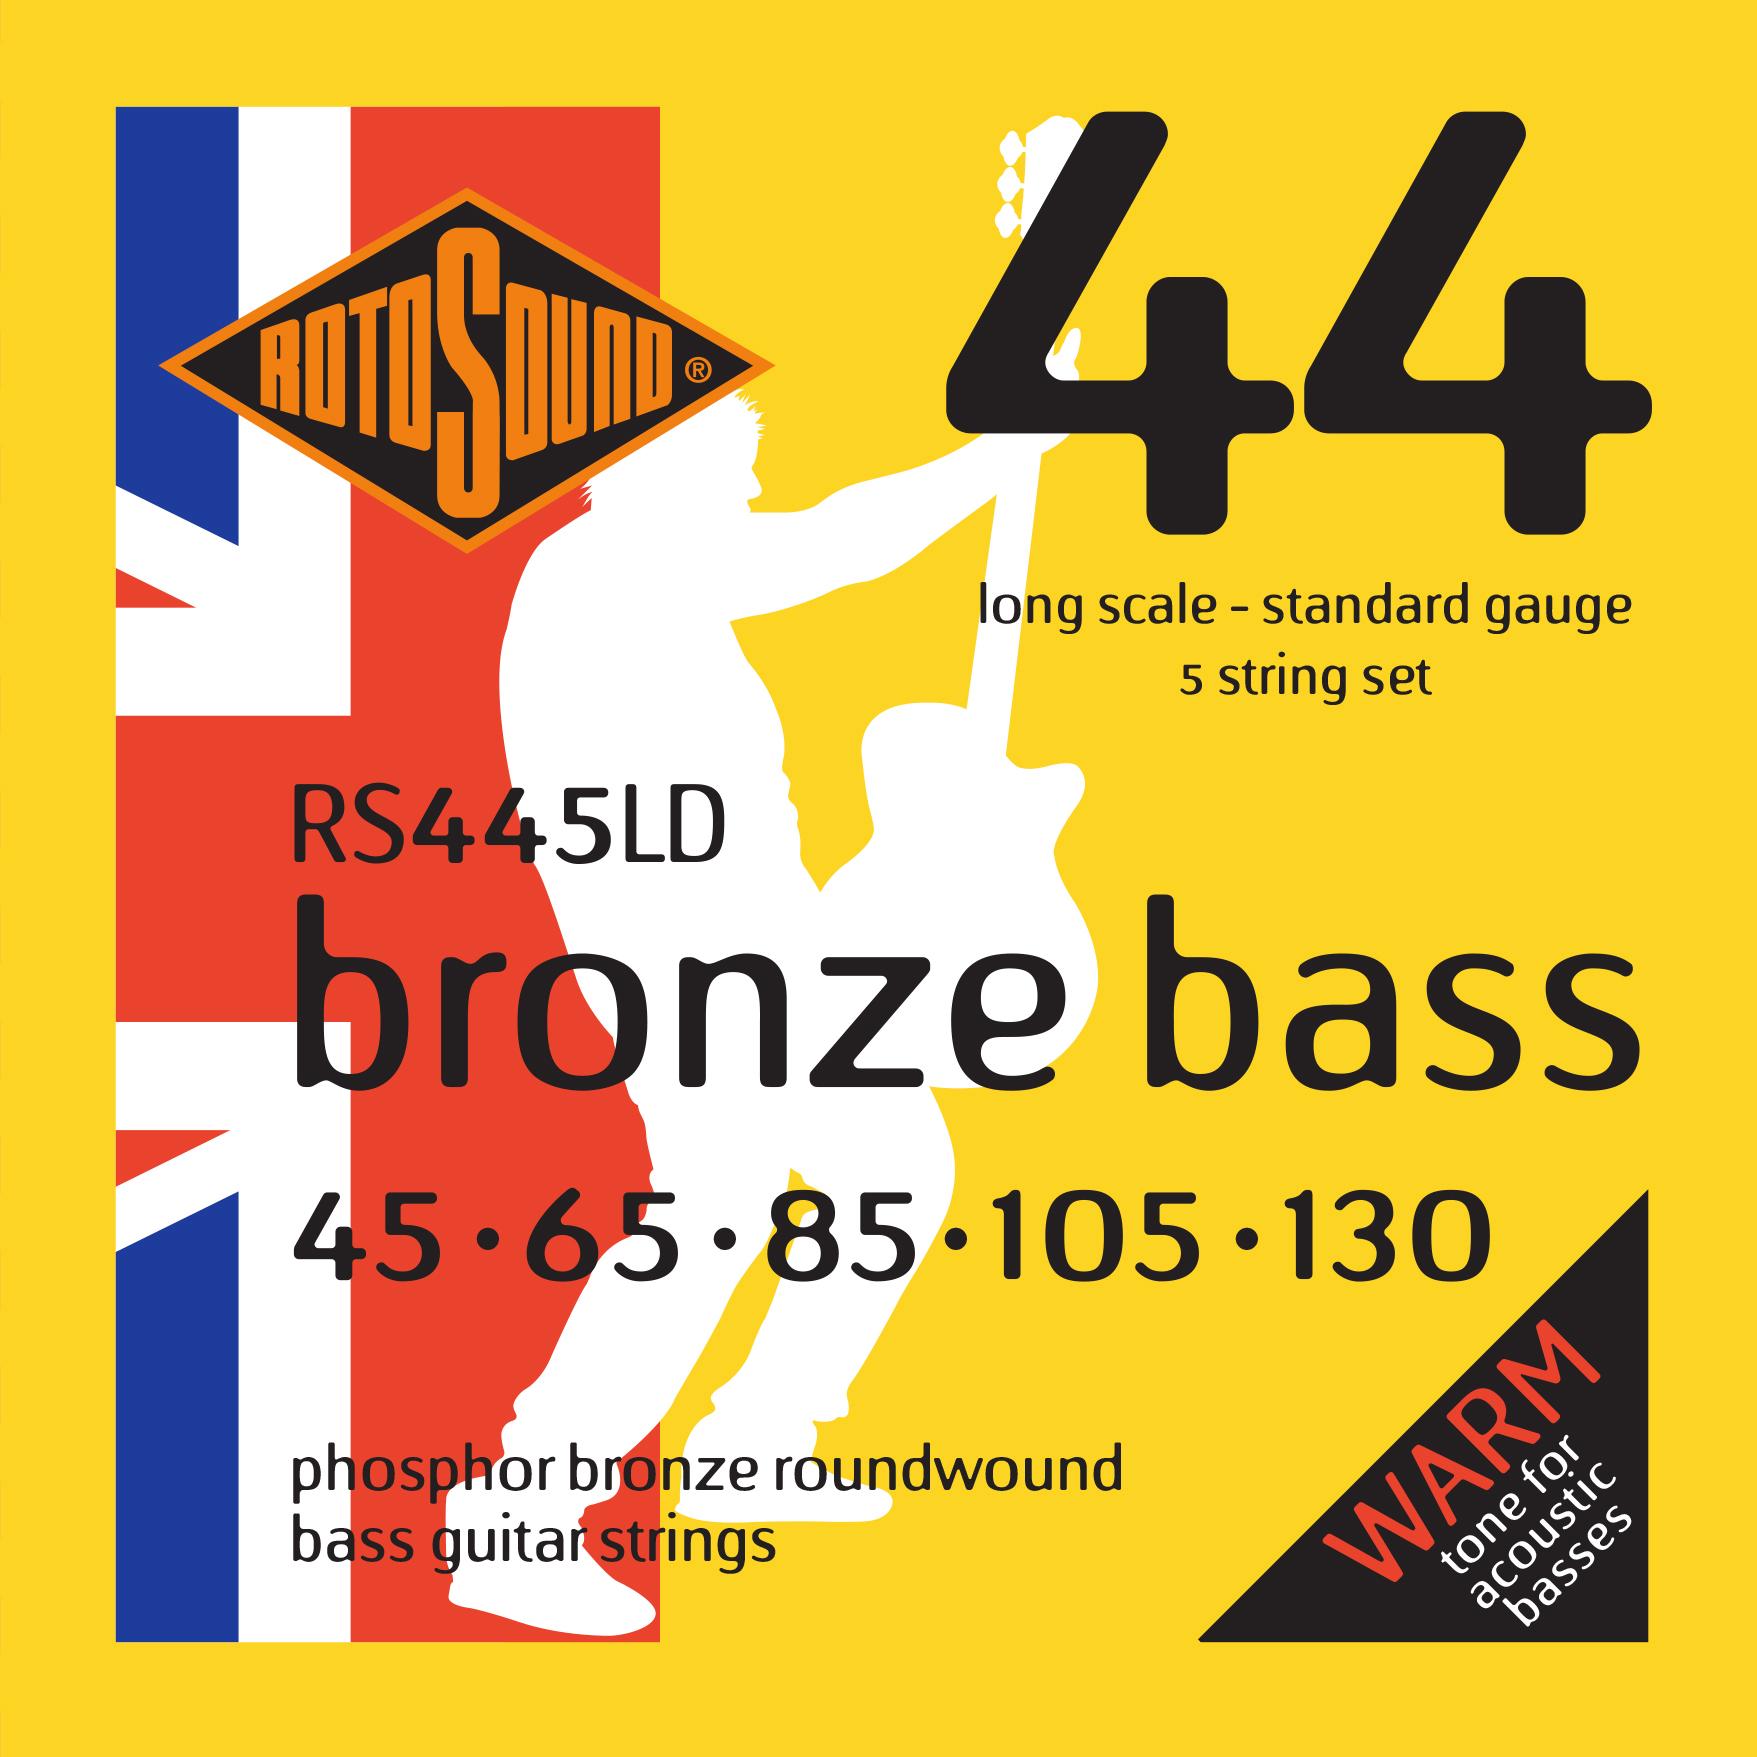 Cordes - CORDES GUITARES BASSES - 5 CORDES - ROTOSOUND - ROTRS445LD - Royez Musik